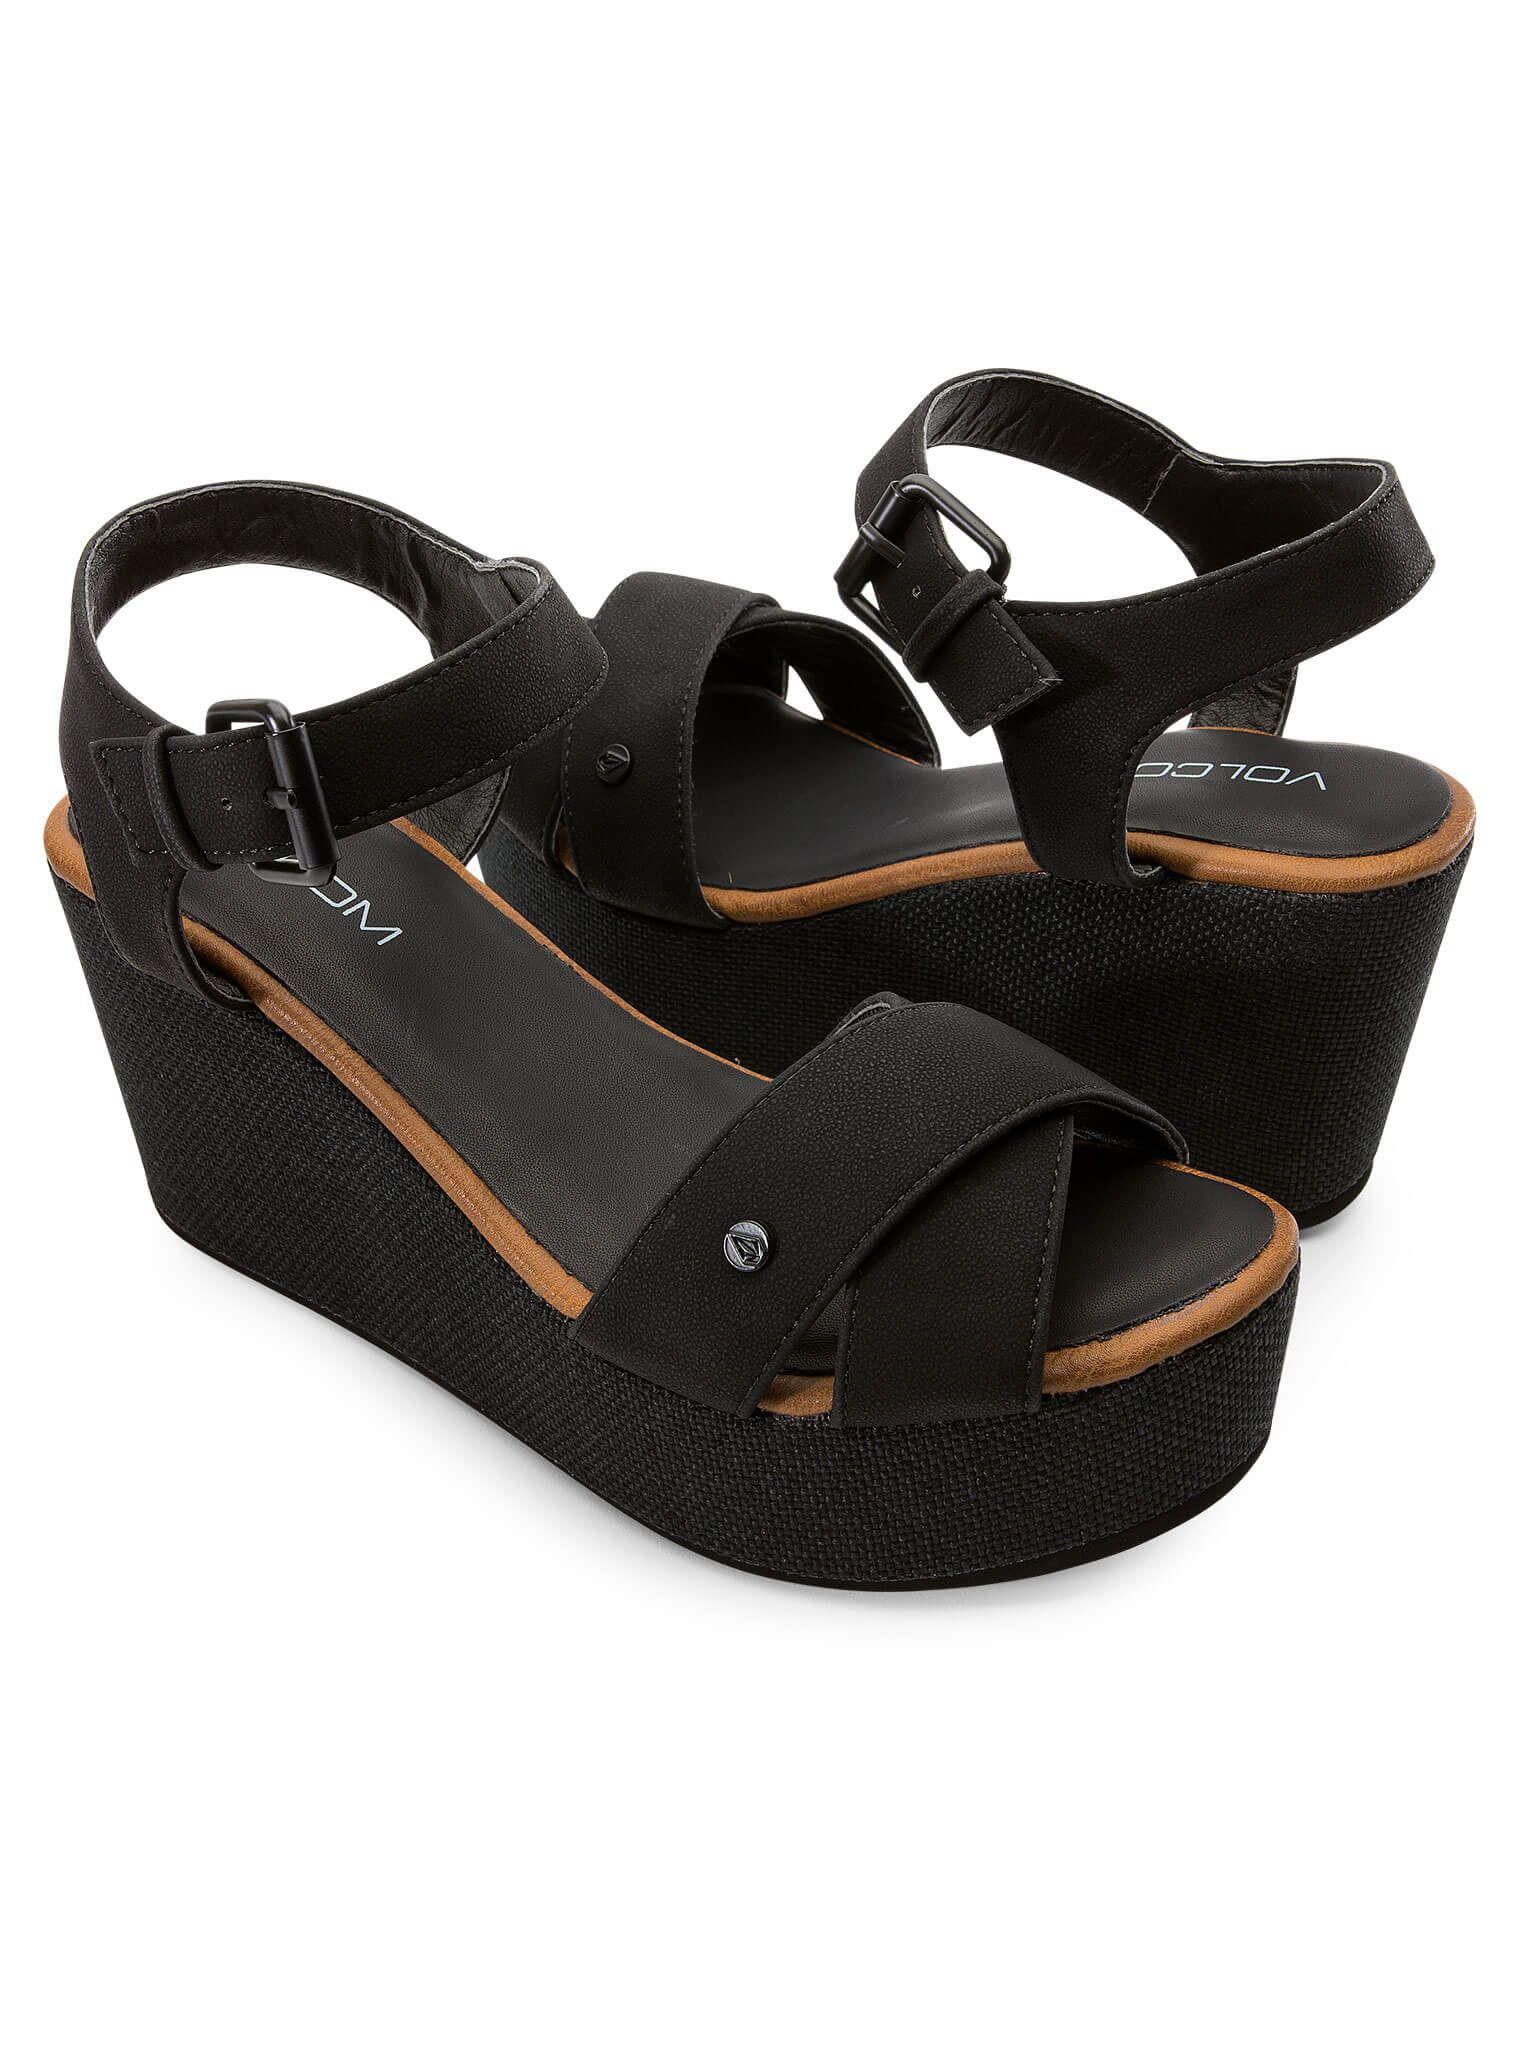 Volcom. Women's Black Stone Platform Sandals